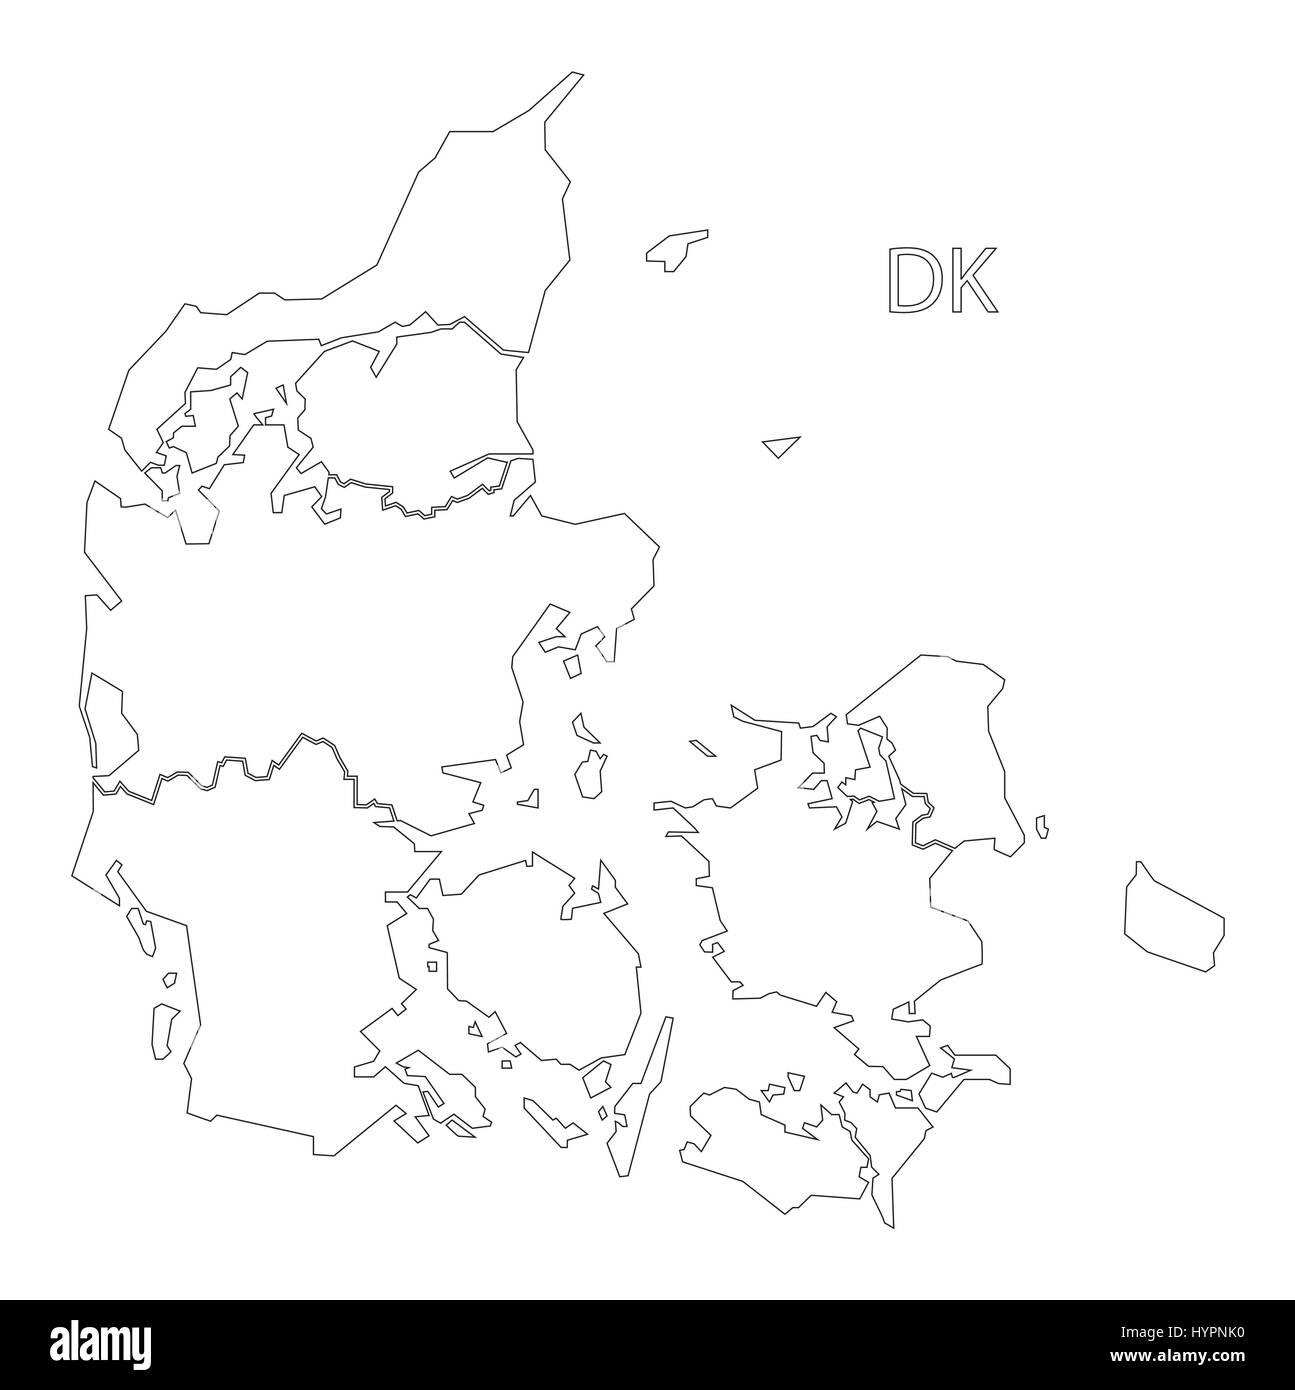 Denmark outline silhouette map illustration with regions - Stock Vector